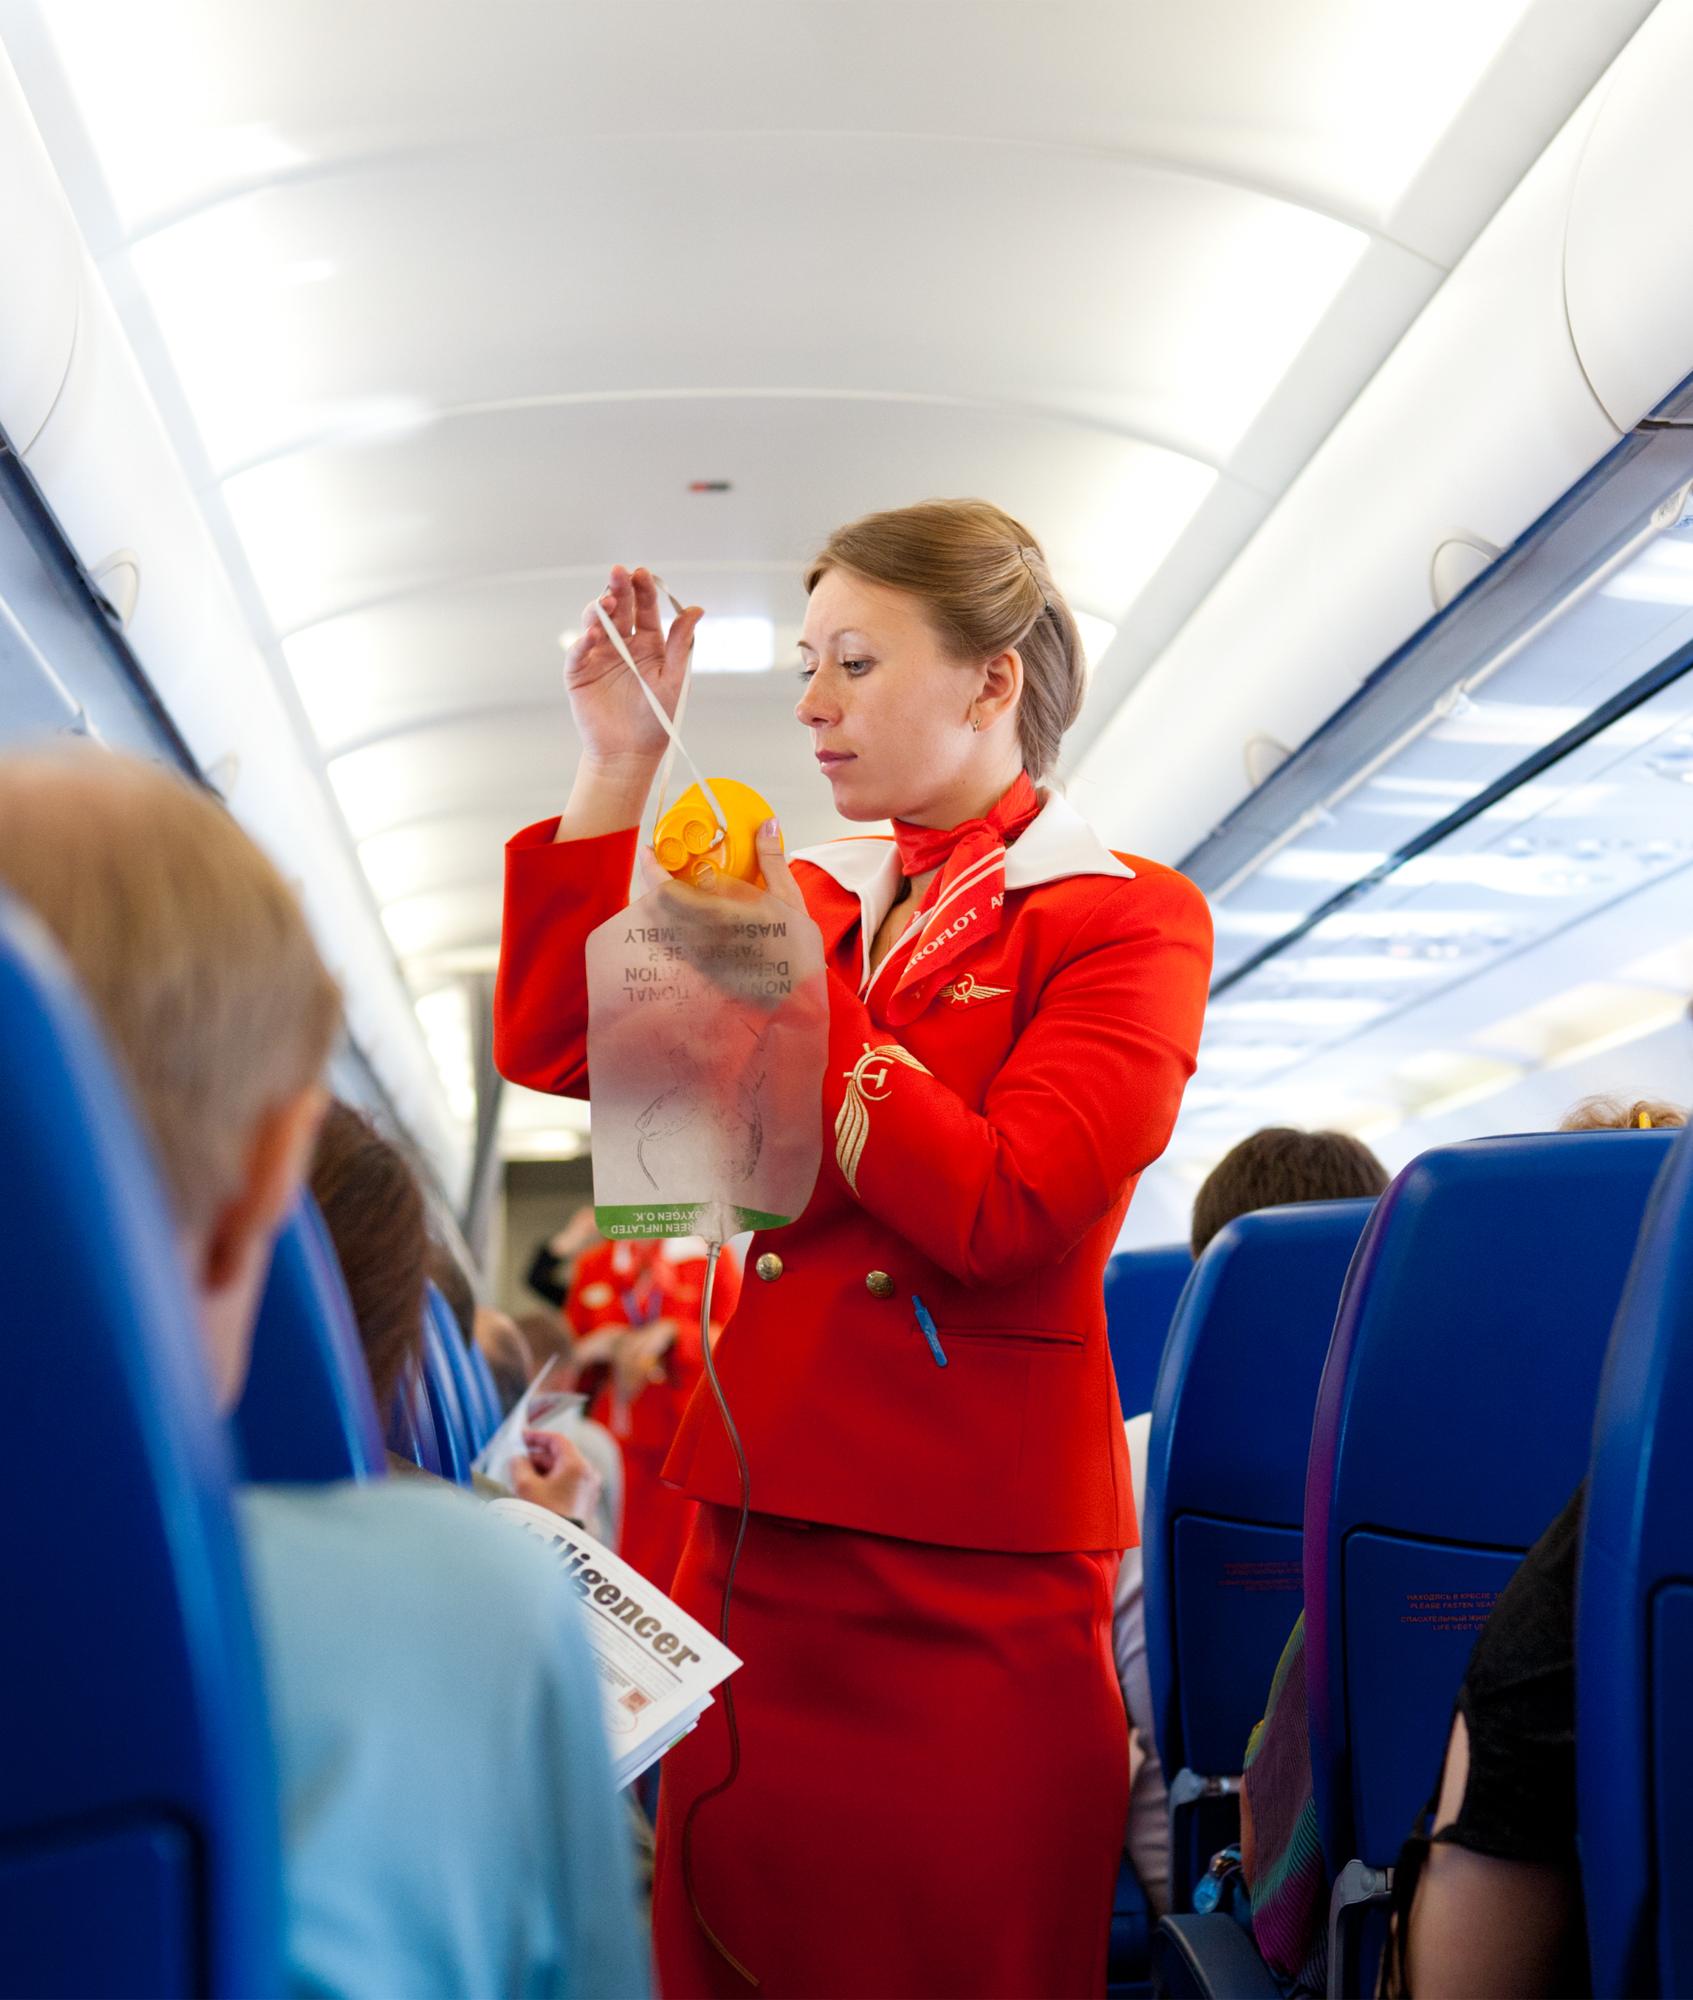 respirator masks for airplane